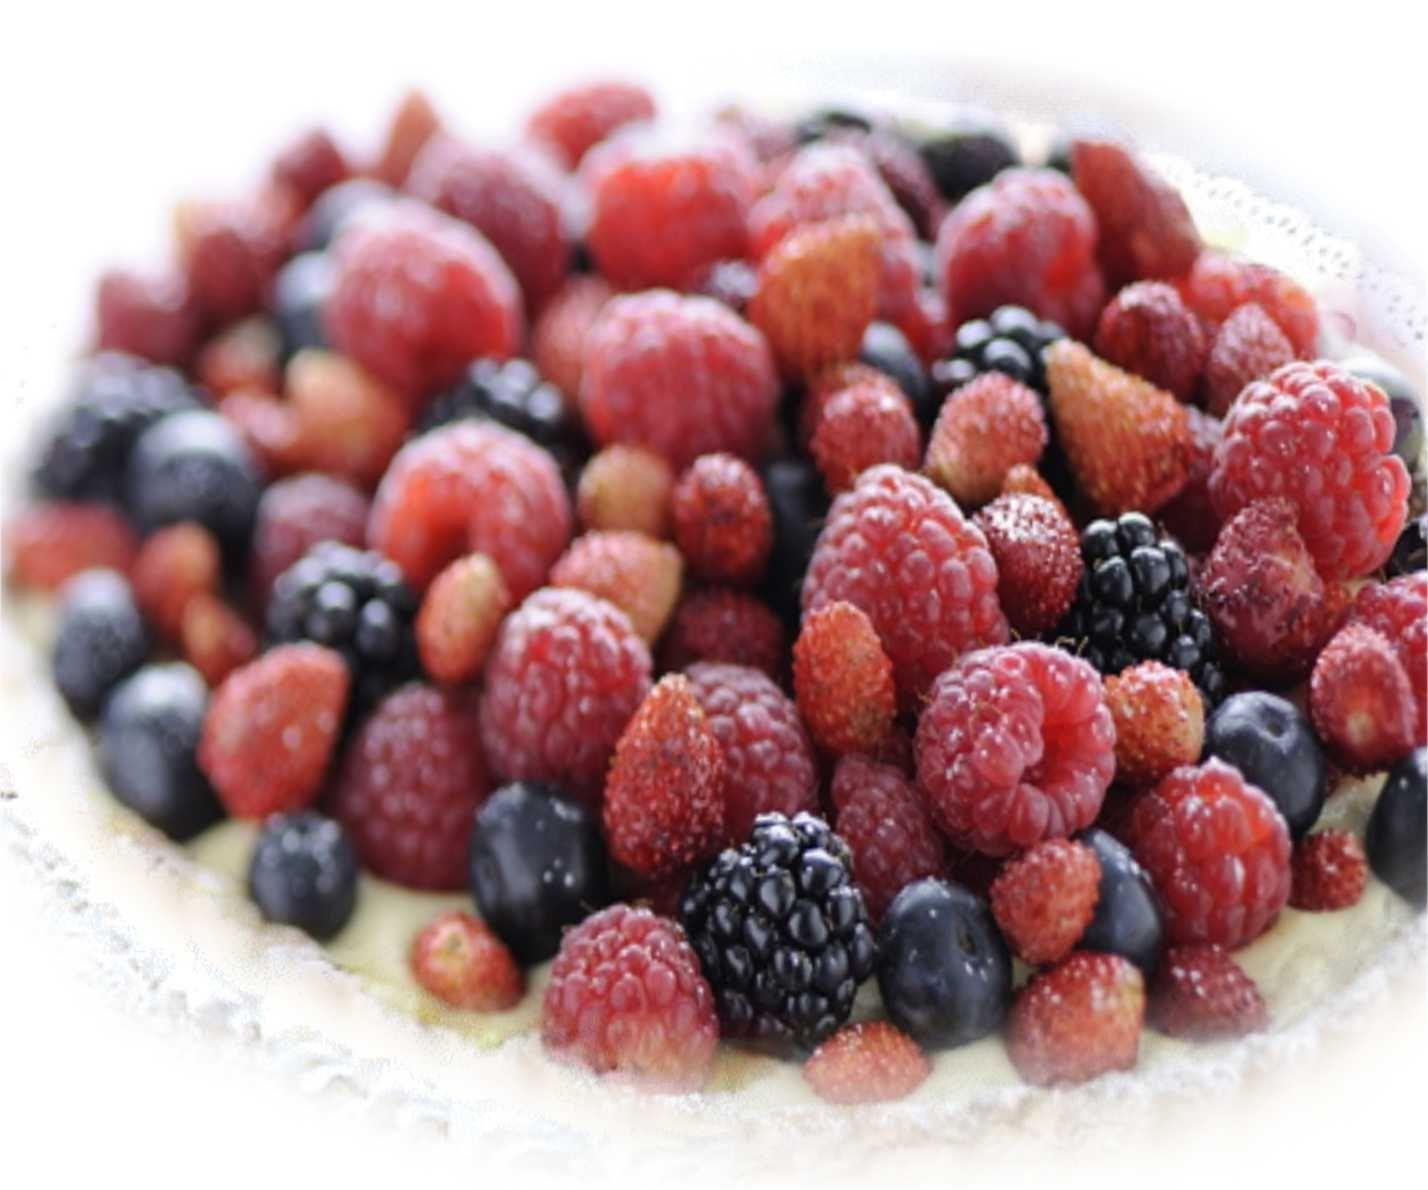 ricc.+fruttidibosco